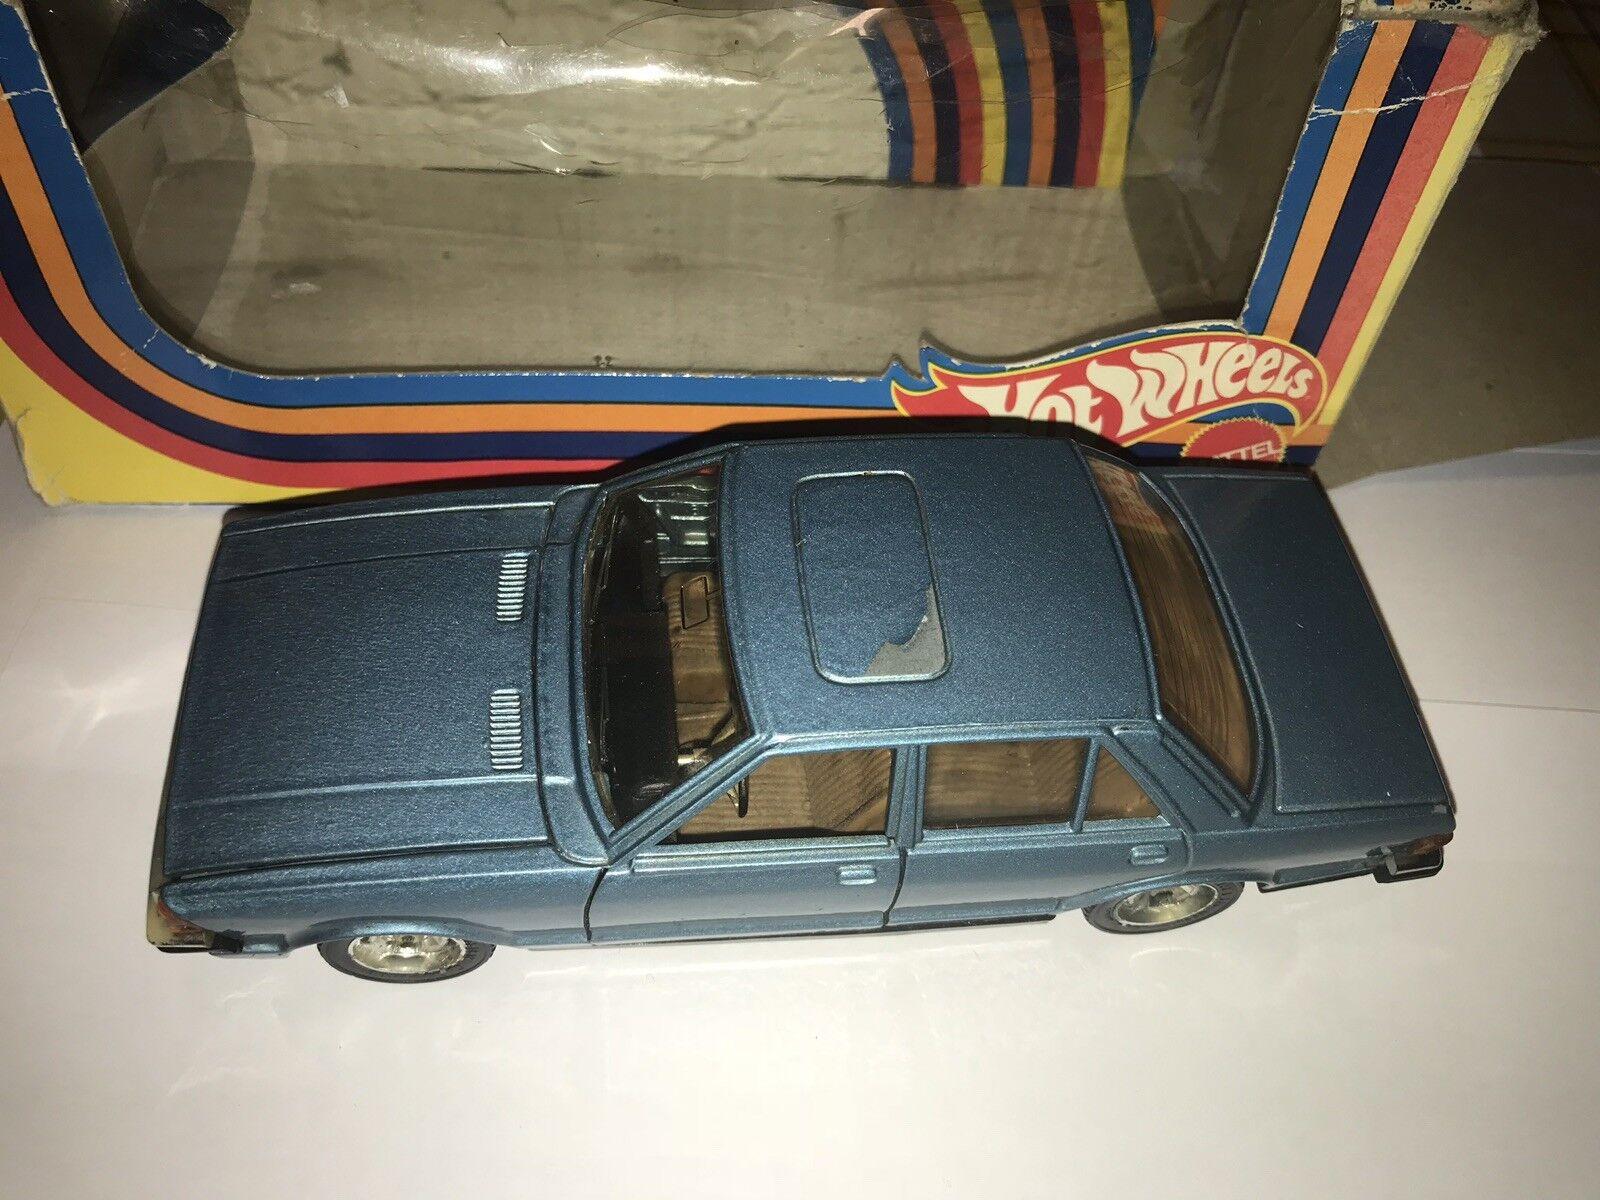 Ford Granada Hotwheels Mattel Mebetoys 1 25 6754